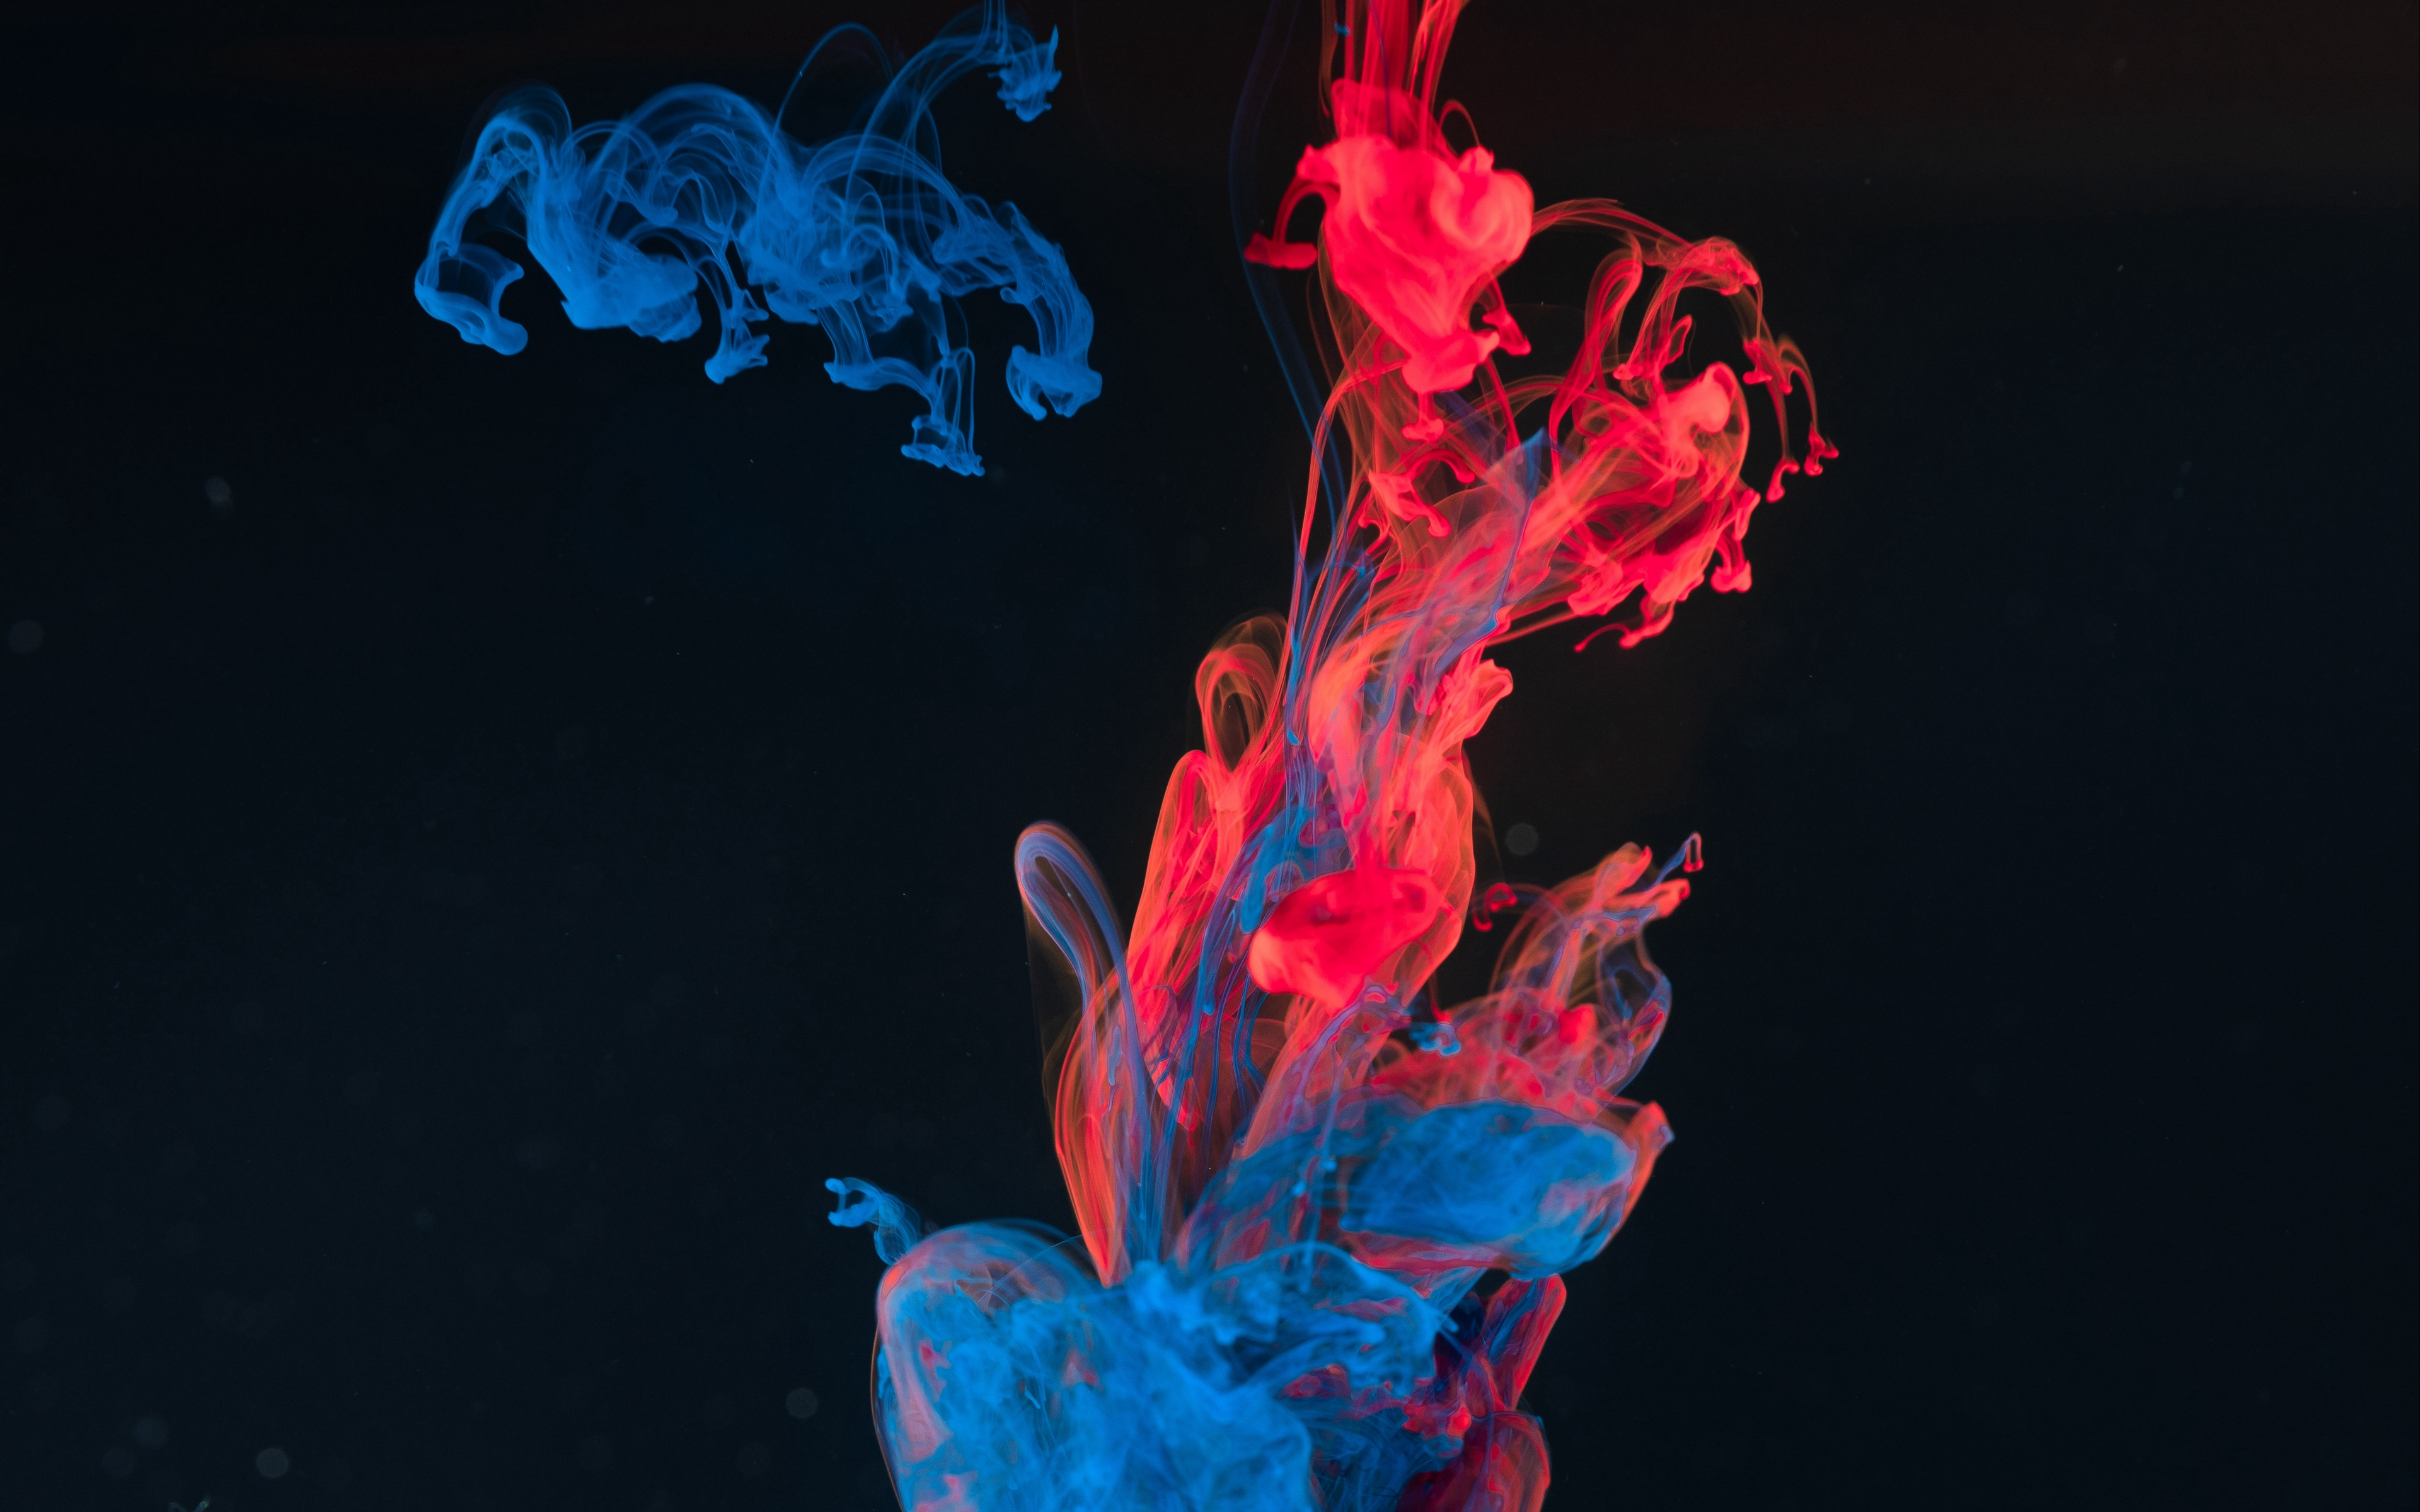 Wallpaper Paint Liquid Clots Abstract Blue Red Iphone Liquid Wallpaper Red 77723 Hd Wallpaper Backgrounds Download